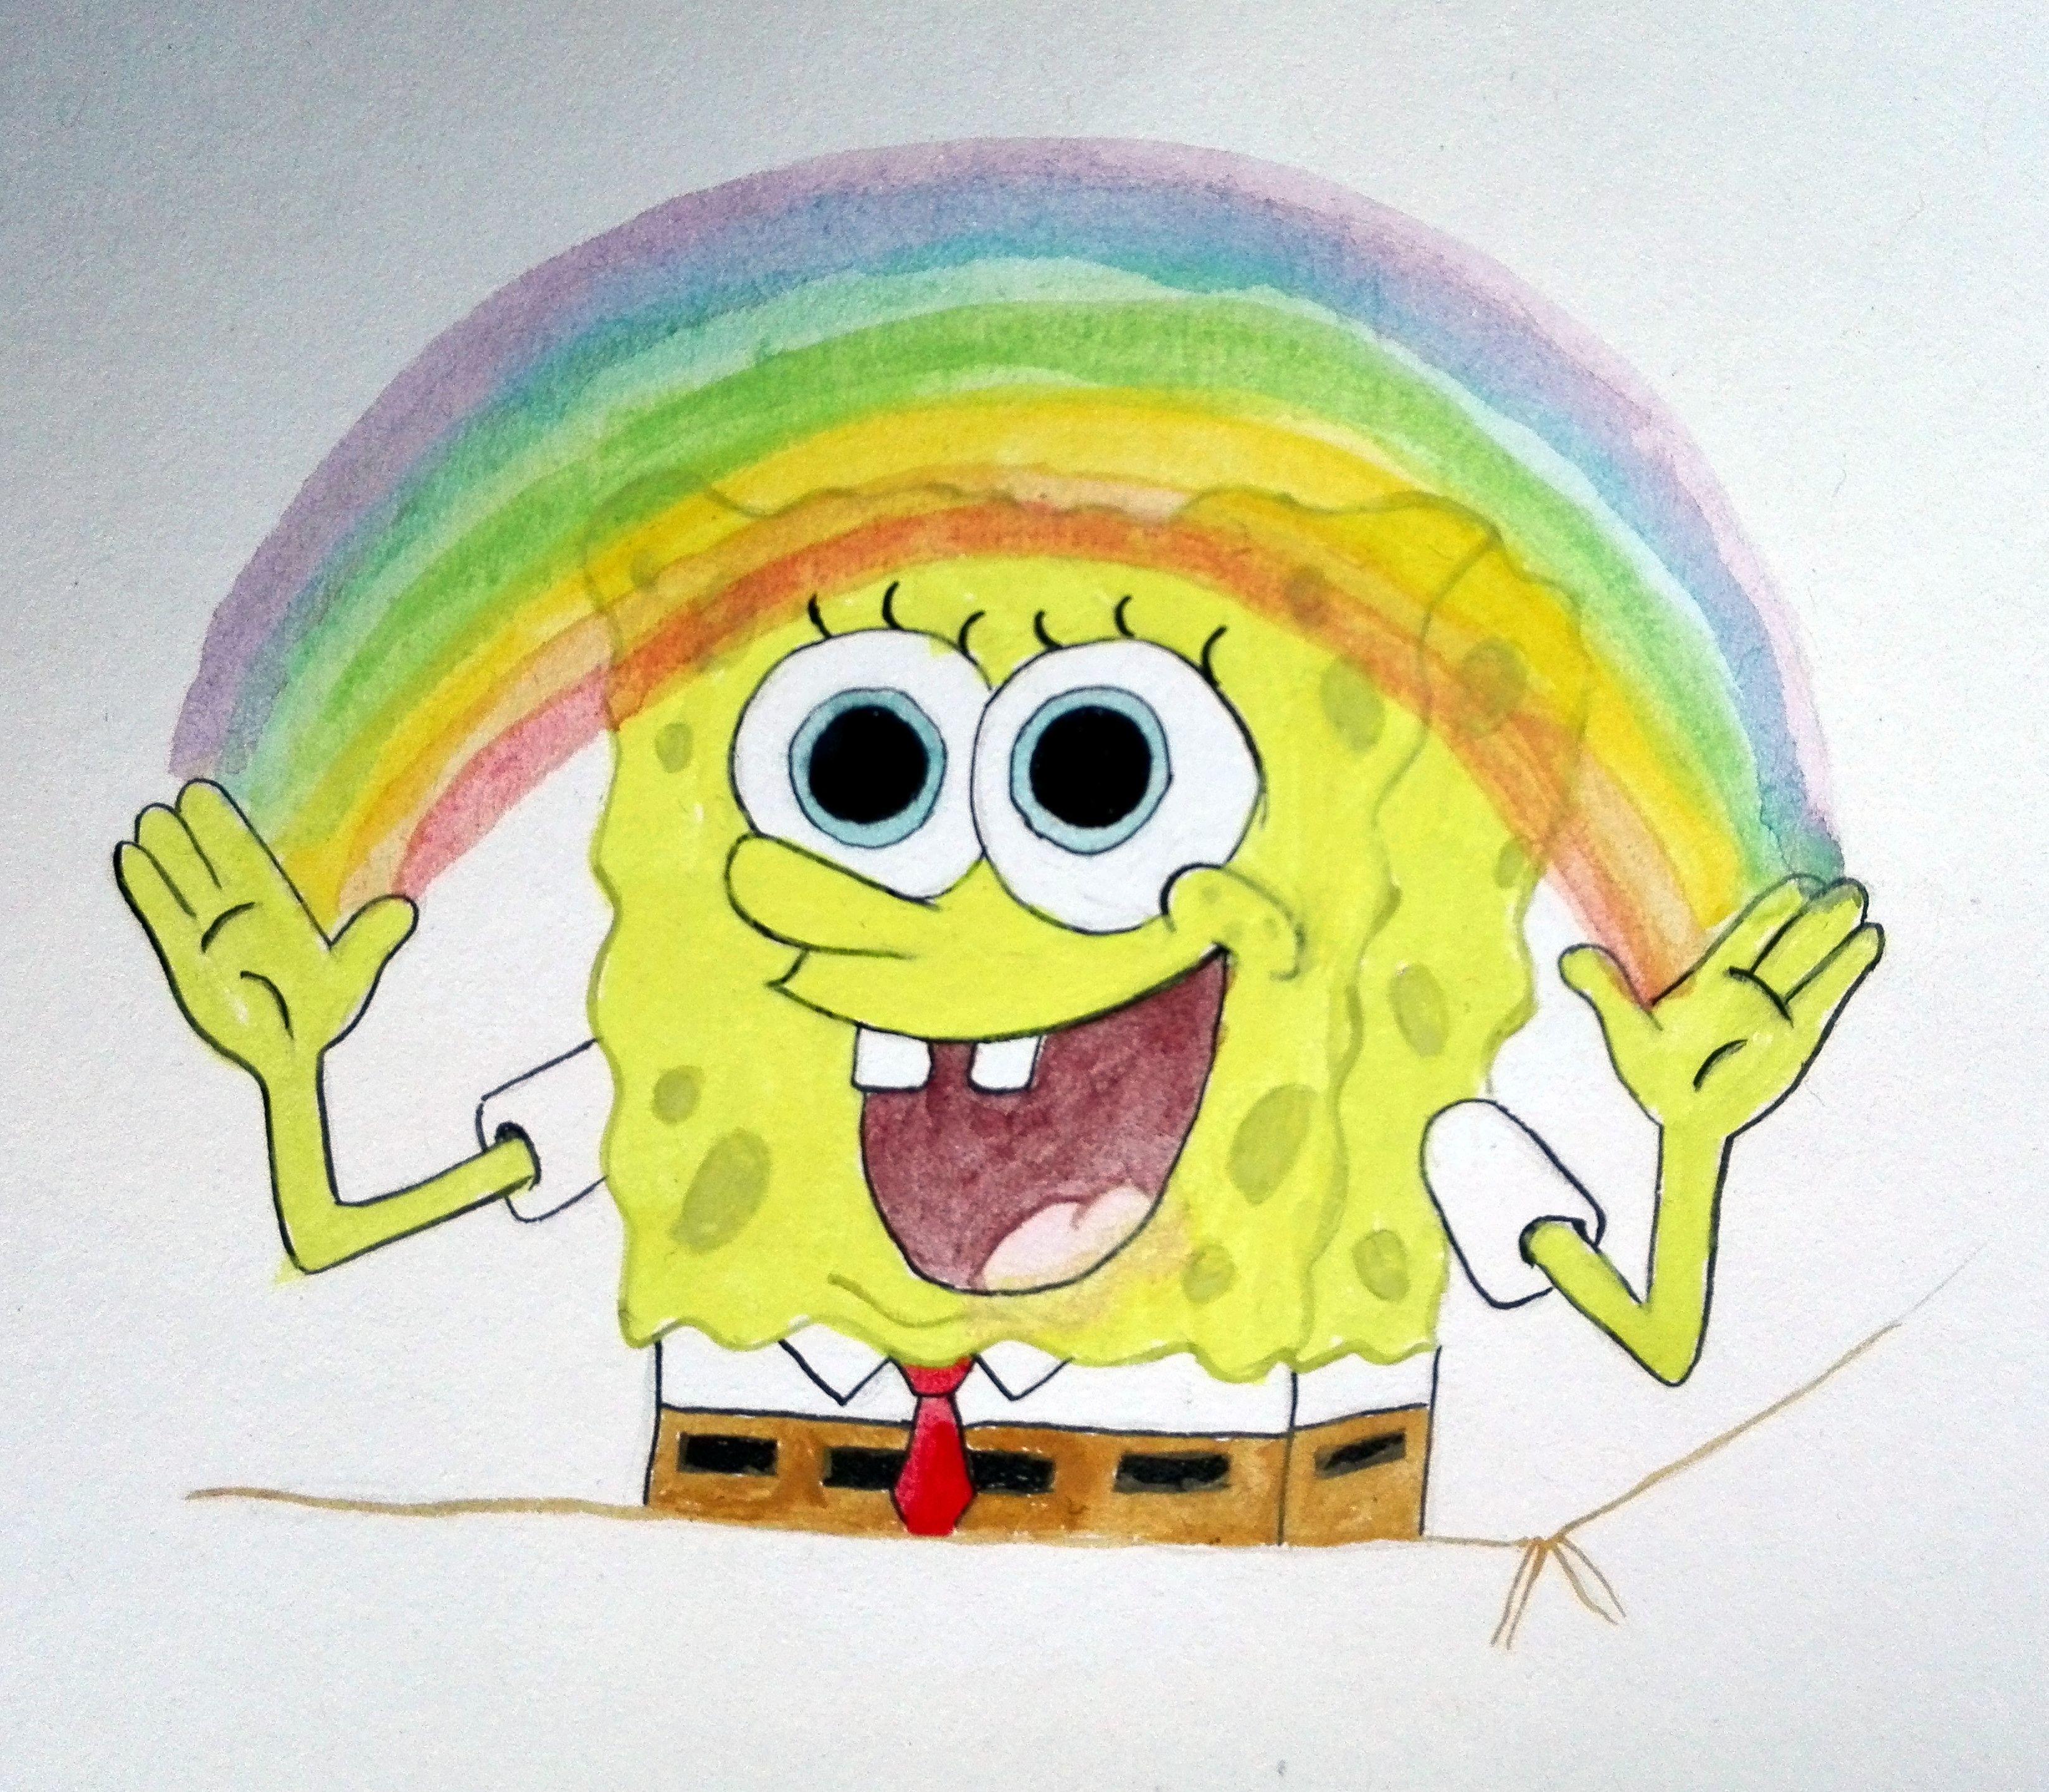 watercolor spongebob imagination rainbow painting